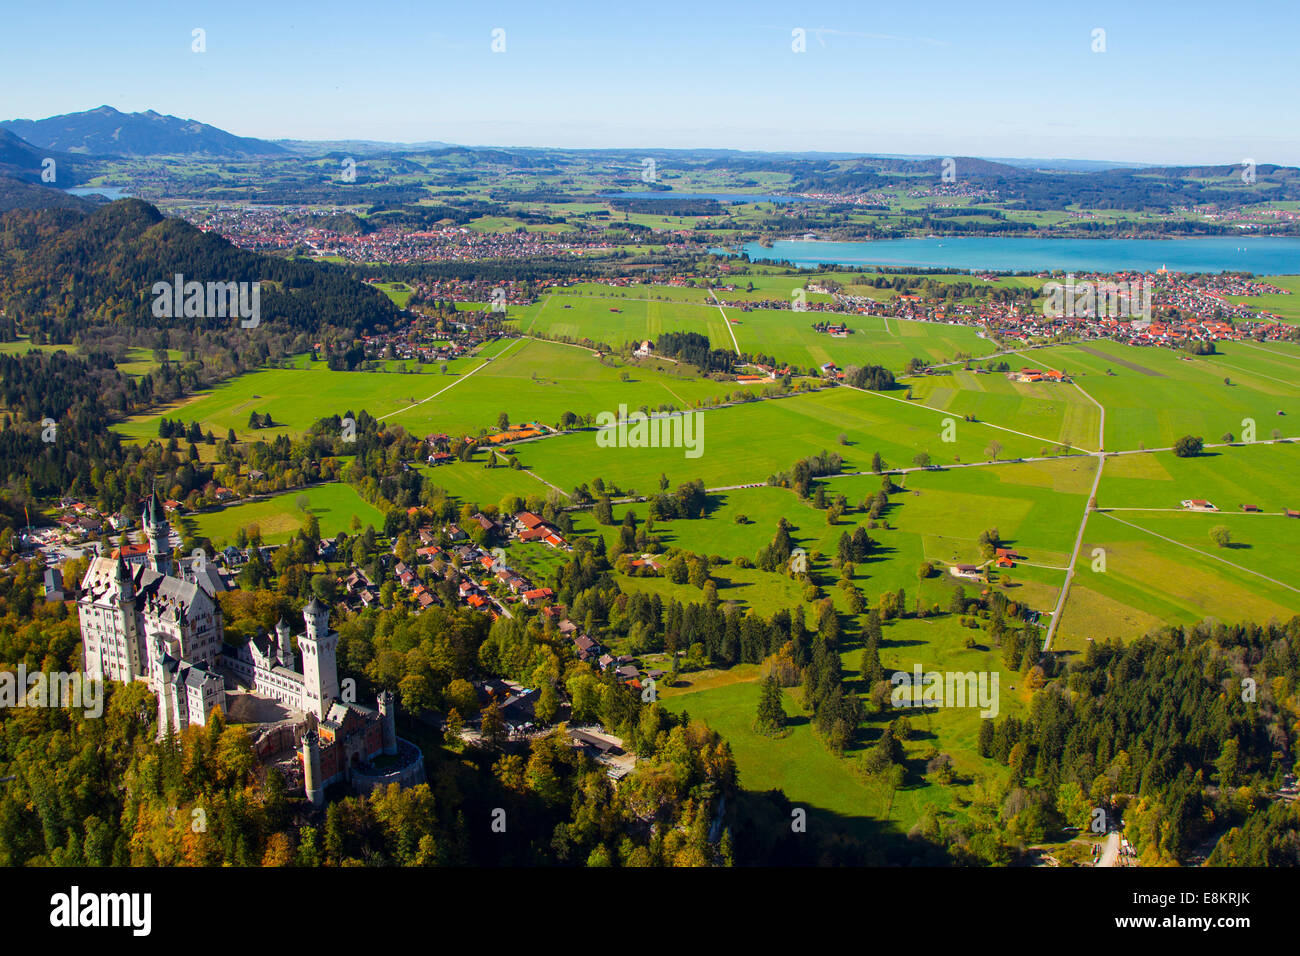 FUSSEN, GERMANY - October 09:  Schloss Neuschwanstein, a castle in Fussen Germany, on the 09 October 2014 (Photo - Stock Image